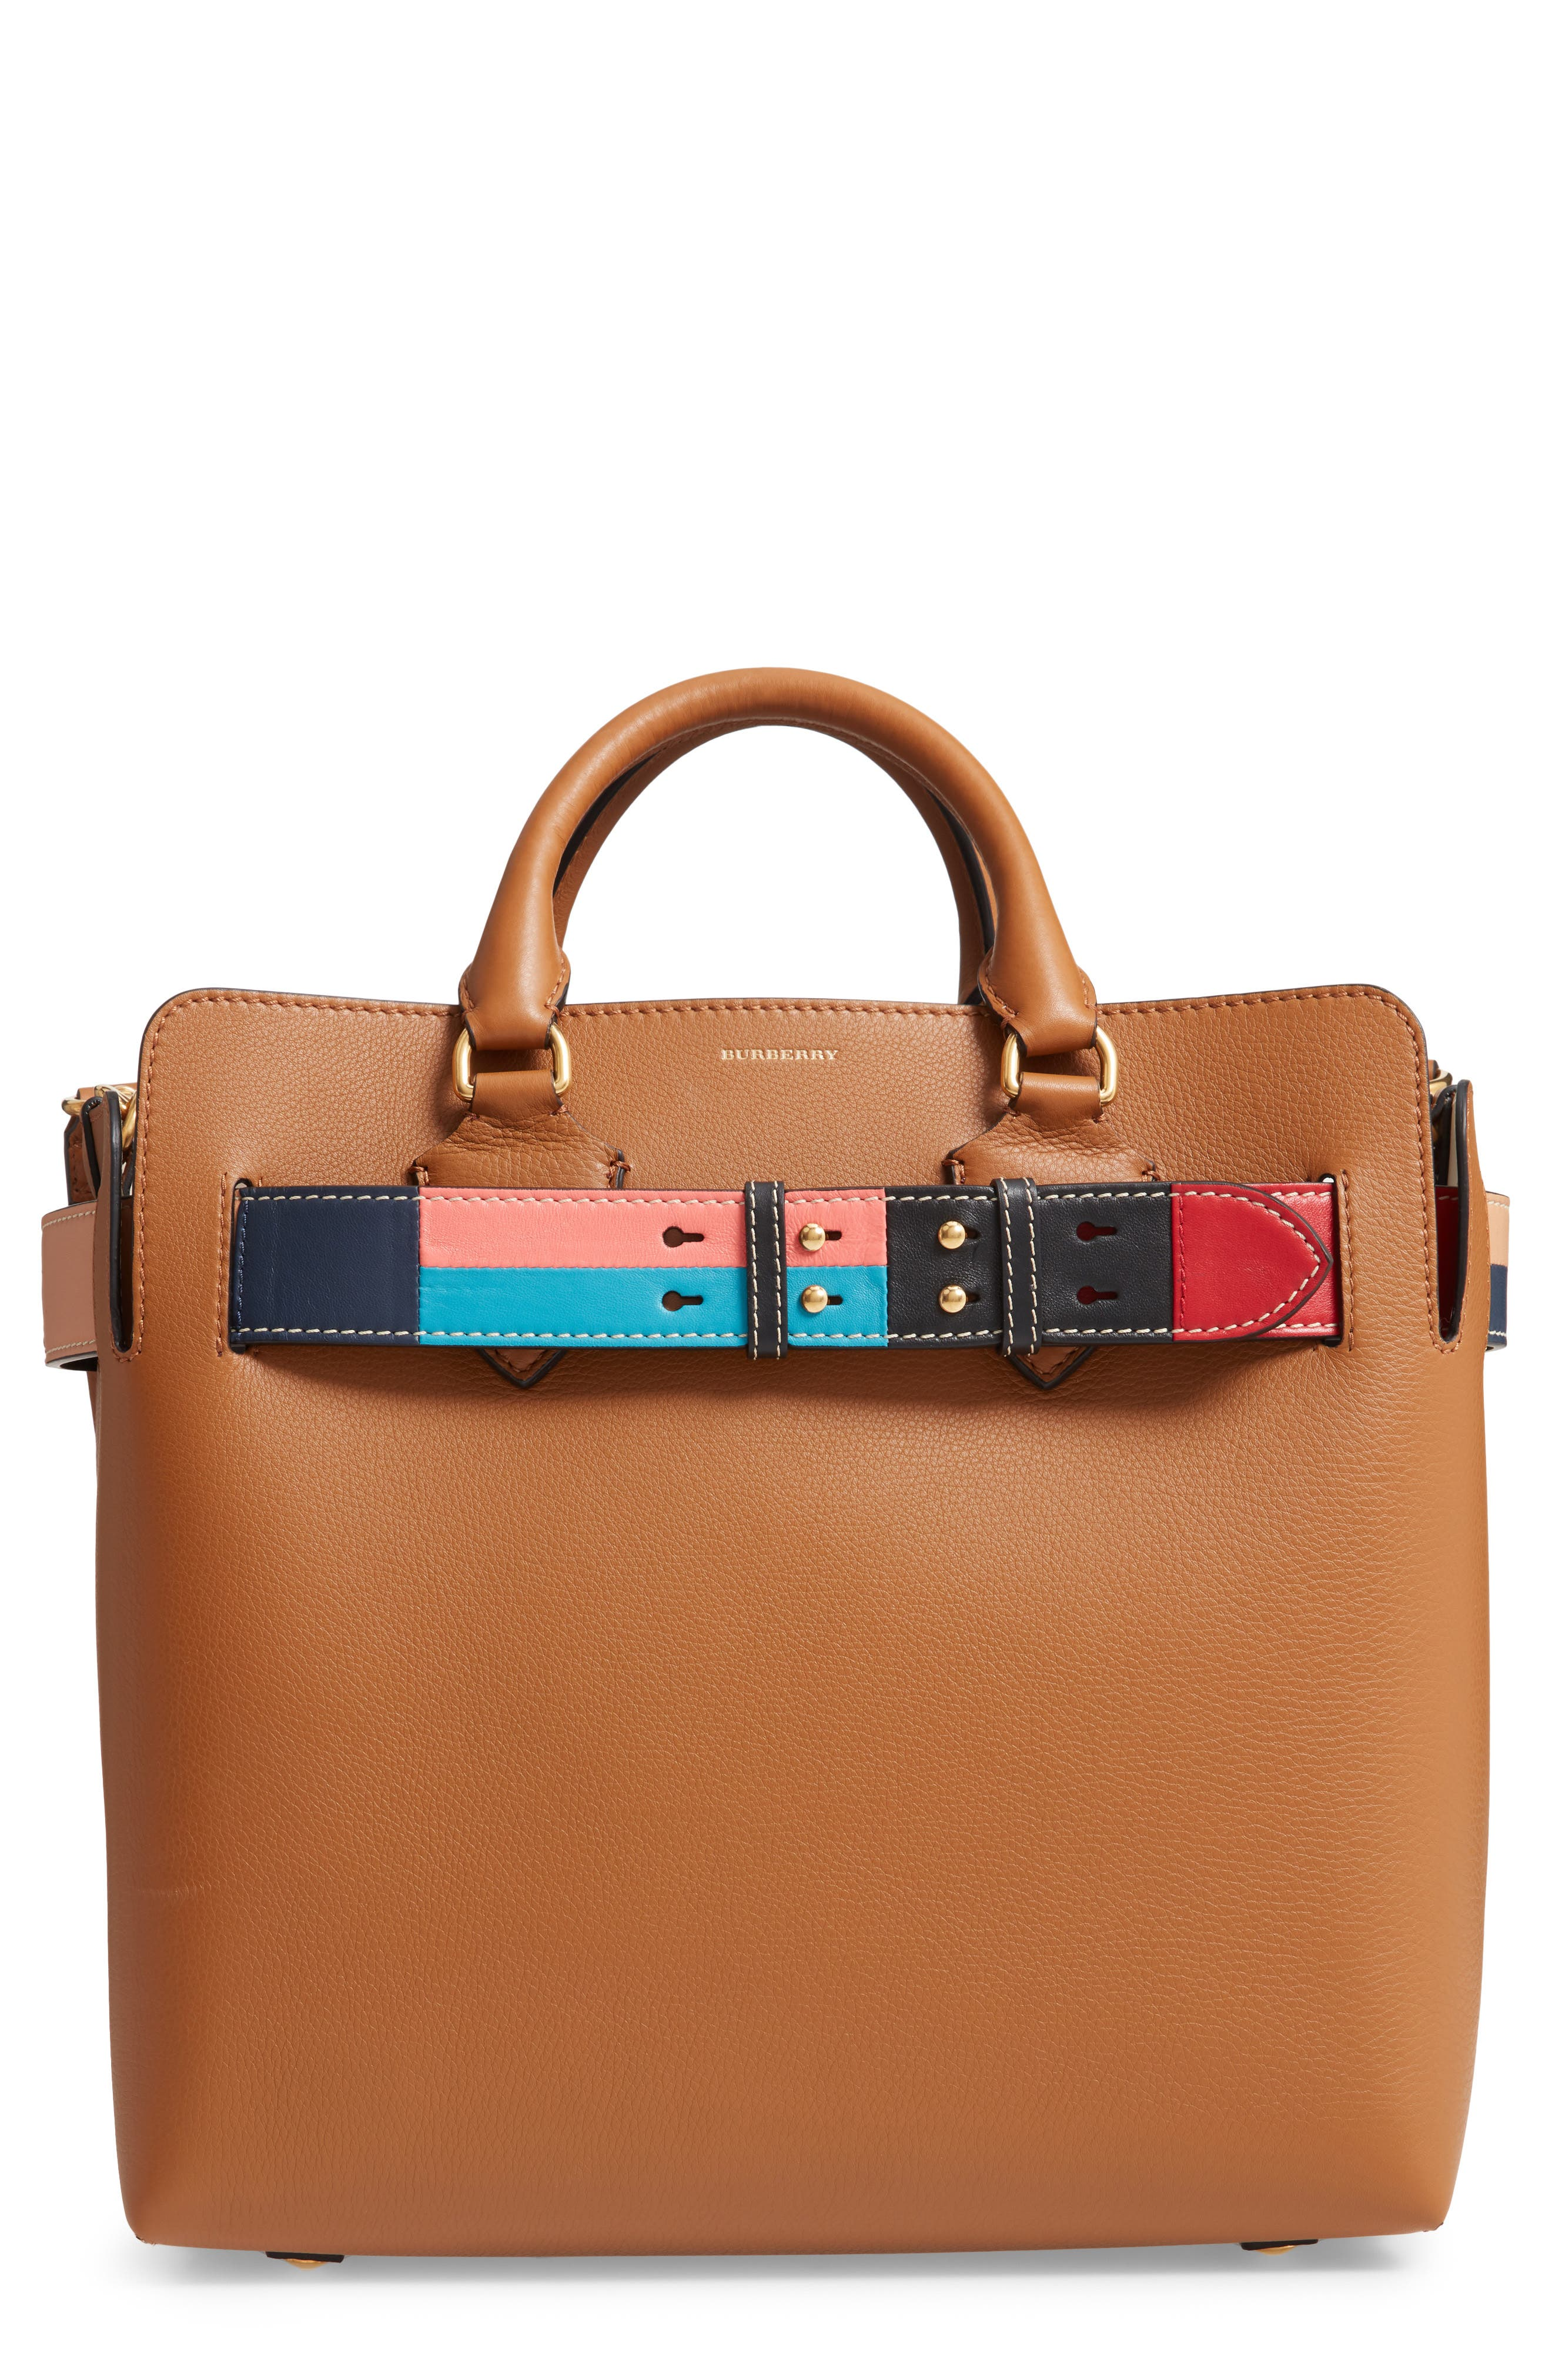 Medium Belt Bag Leather Tote,                             Main thumbnail 1, color,                             COGNAC